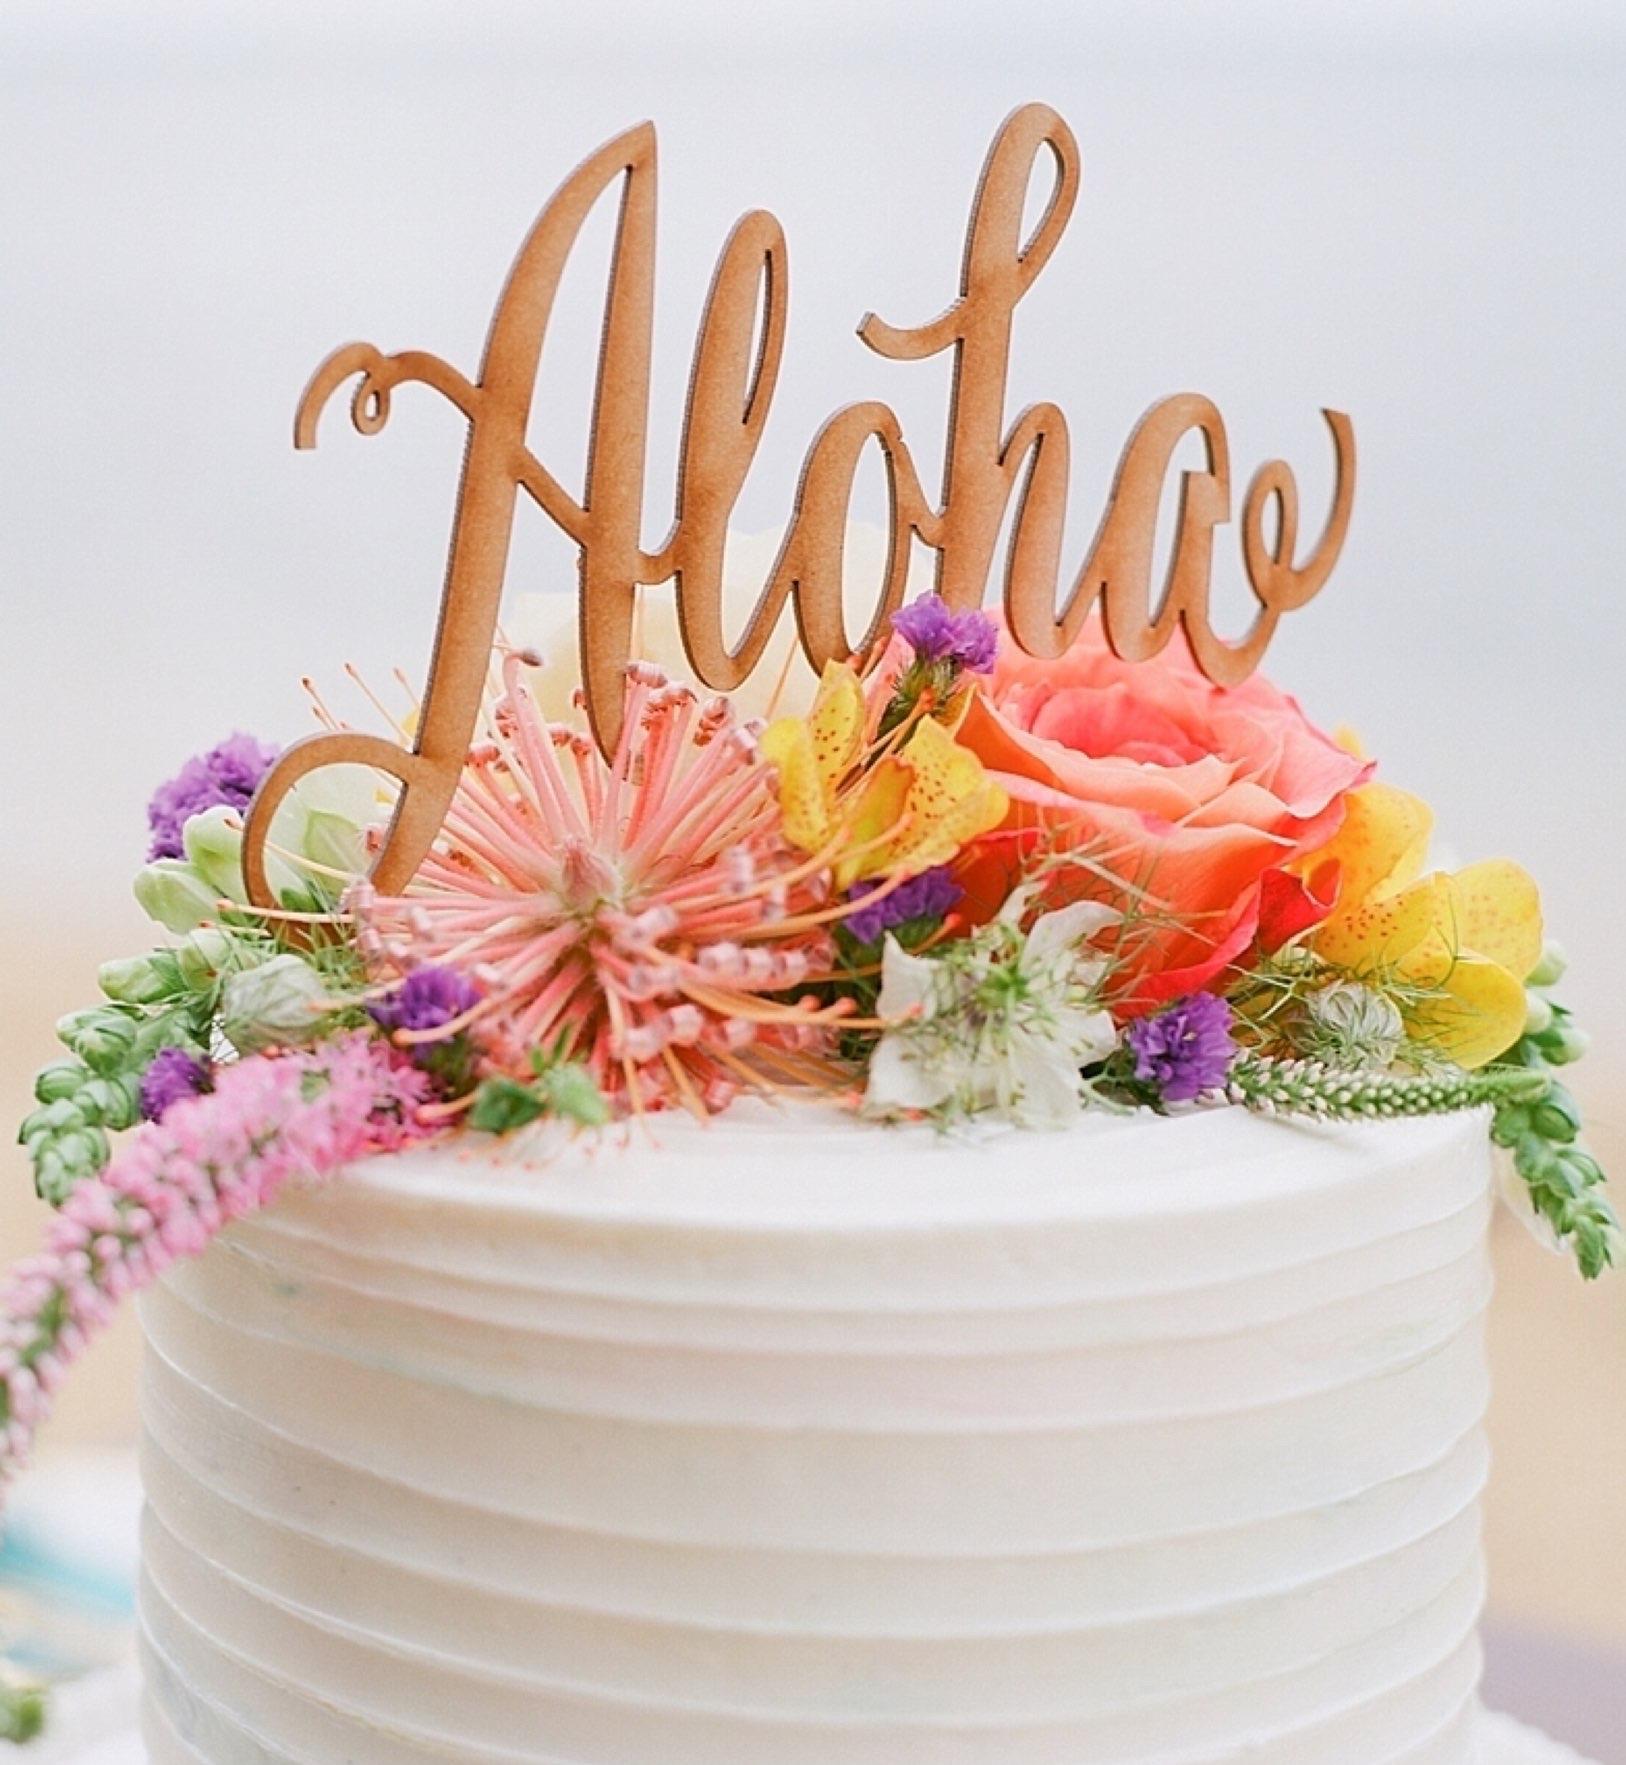 Cake on the beach in Kauai.